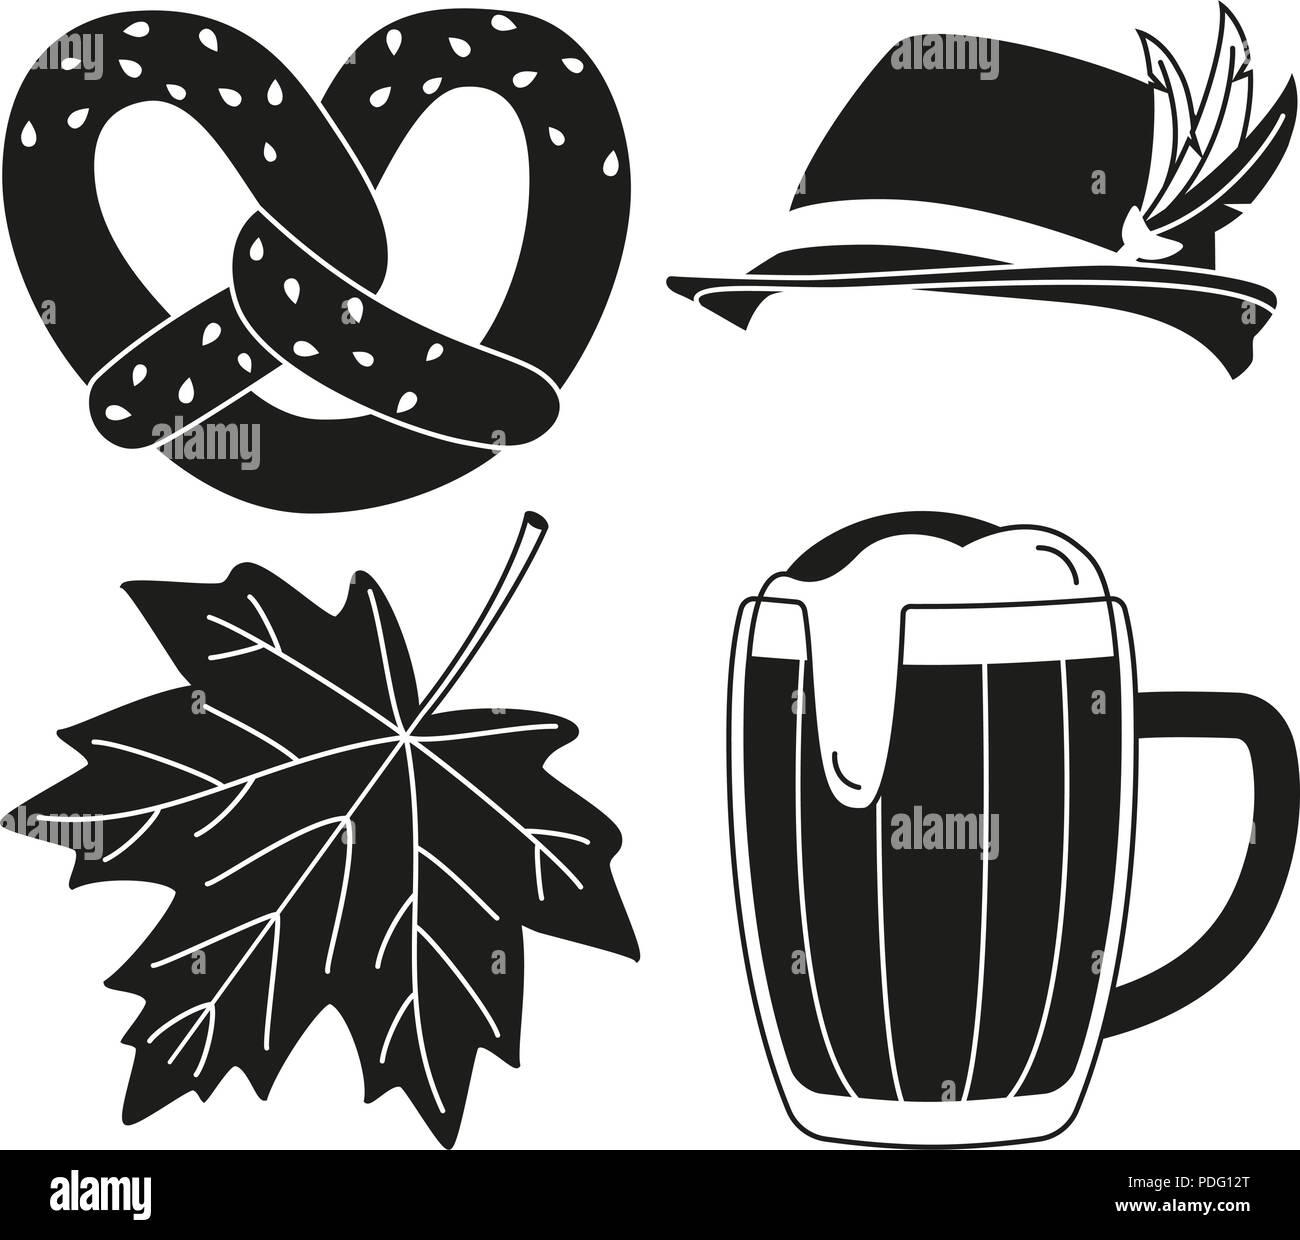 Black white oktoberfest 4 elements silhouette set - Stock Vector